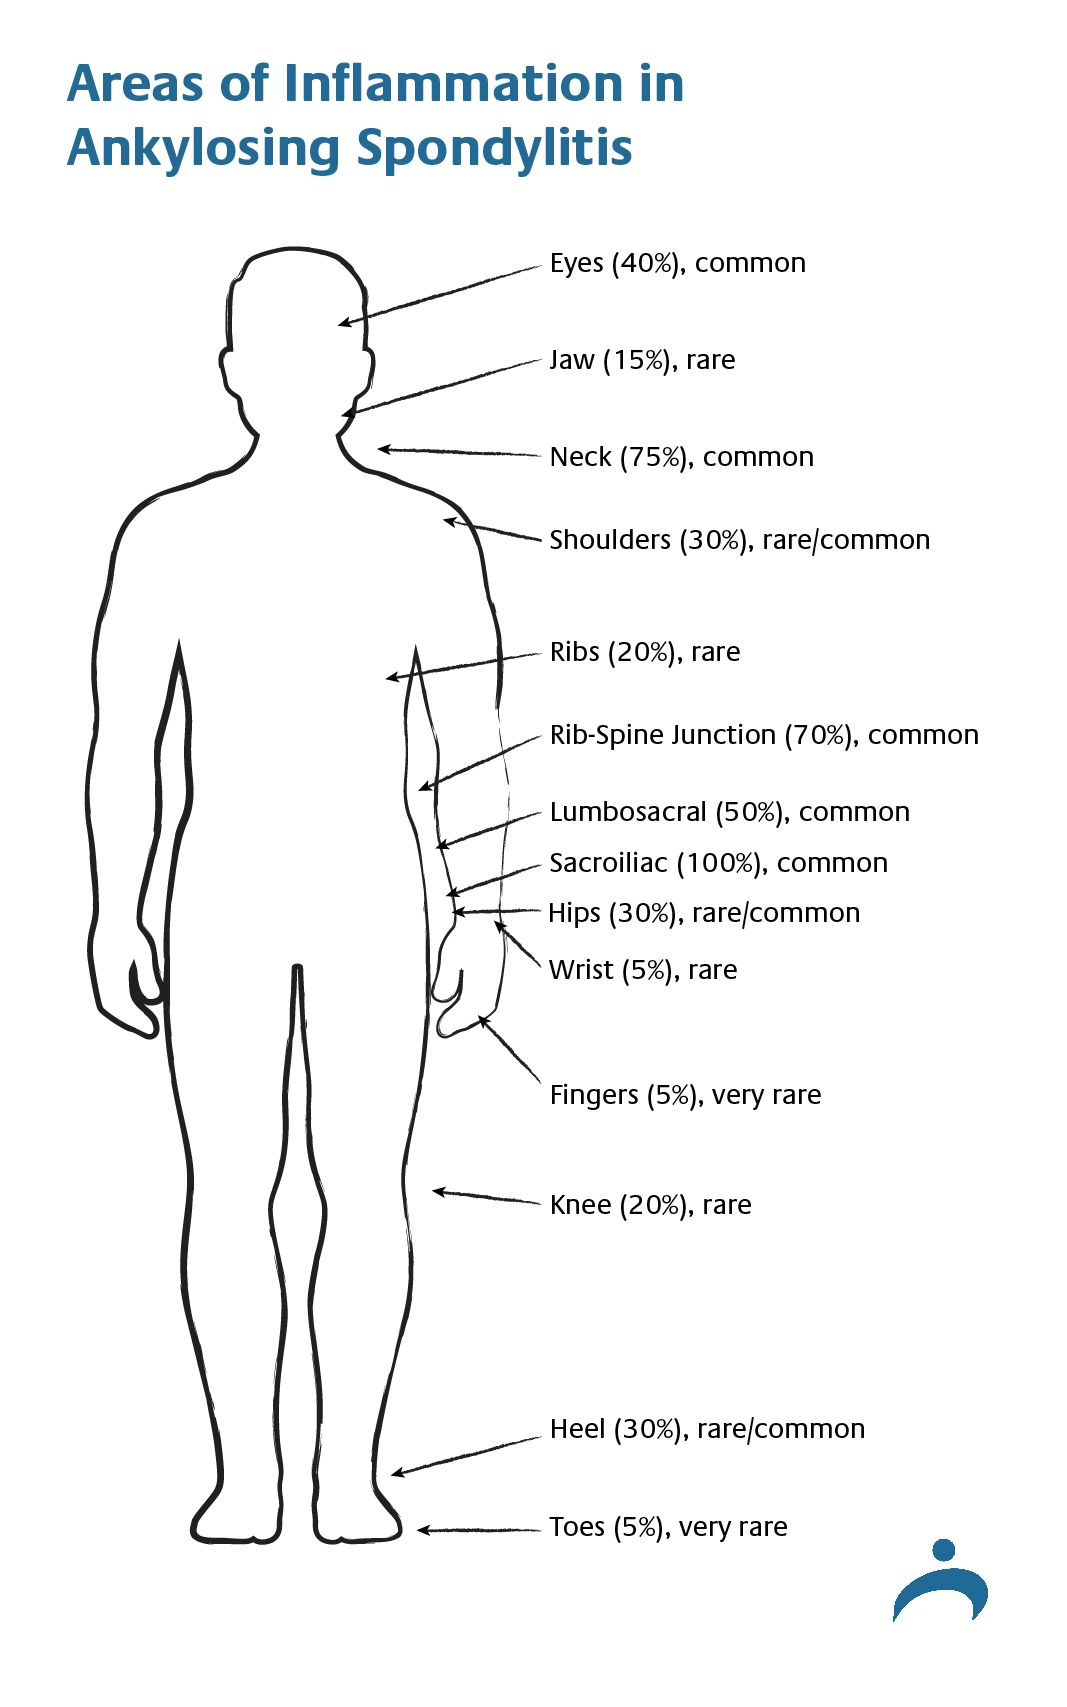 medium resolution of areas of inflammation in ankylosing spondylitis diagram